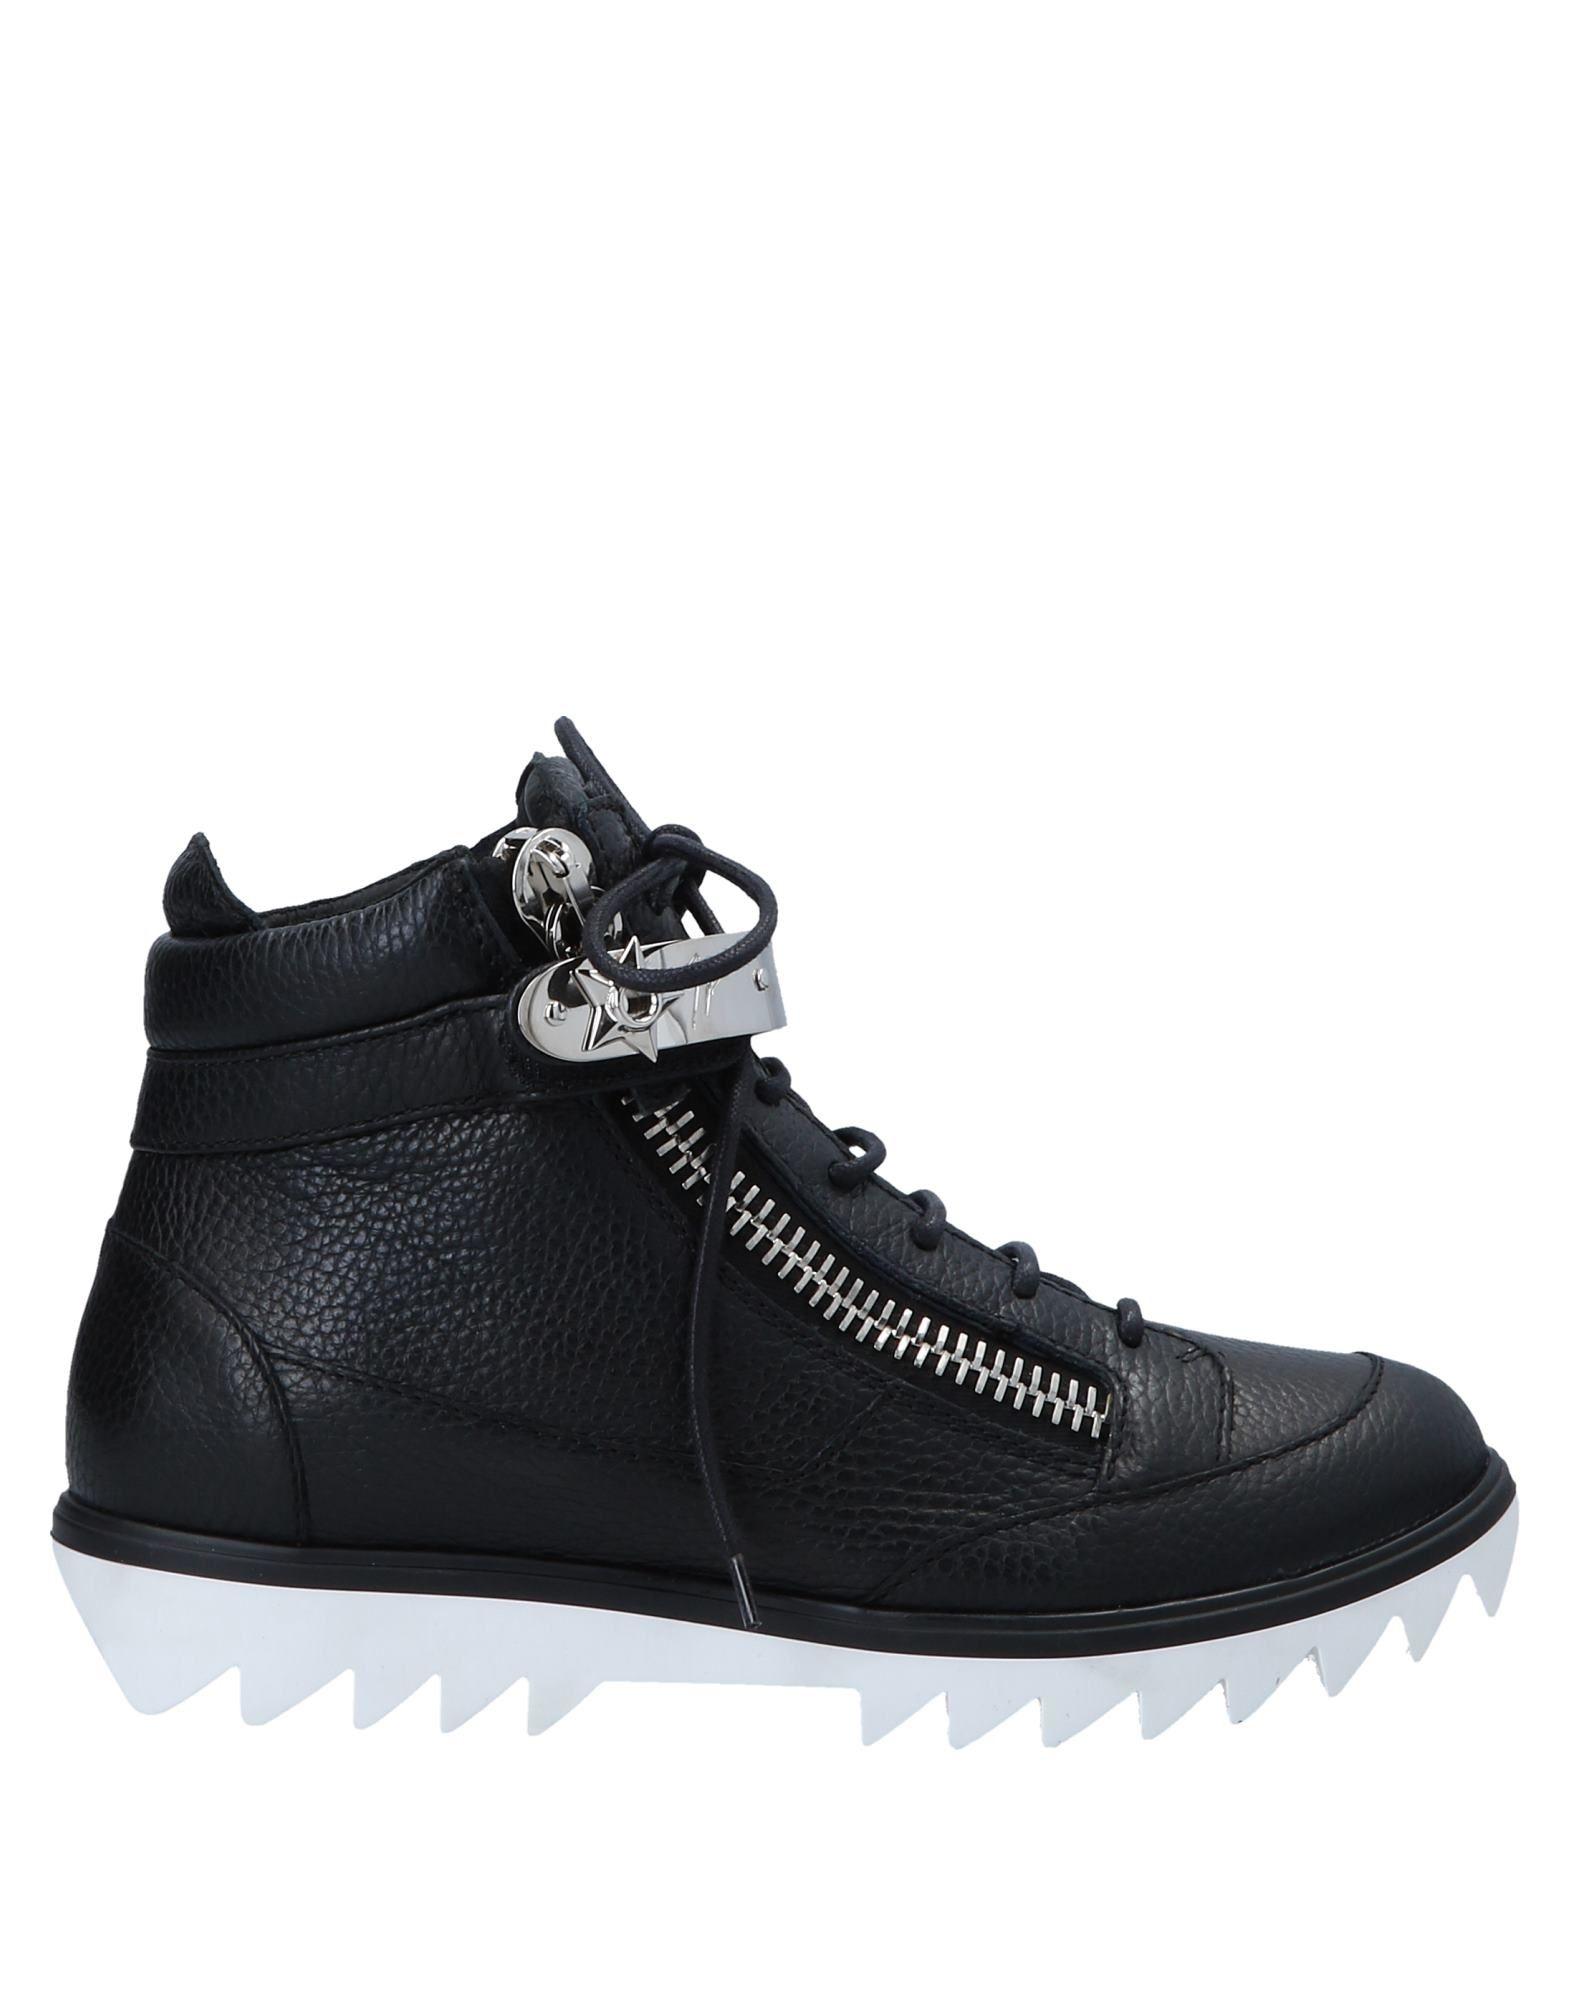 Giuseppe Giuseppe Zanotti Sneakers - Women Giuseppe Giuseppe Zanotti Sneakers online on  Australia - 11546974BF 80aa2e